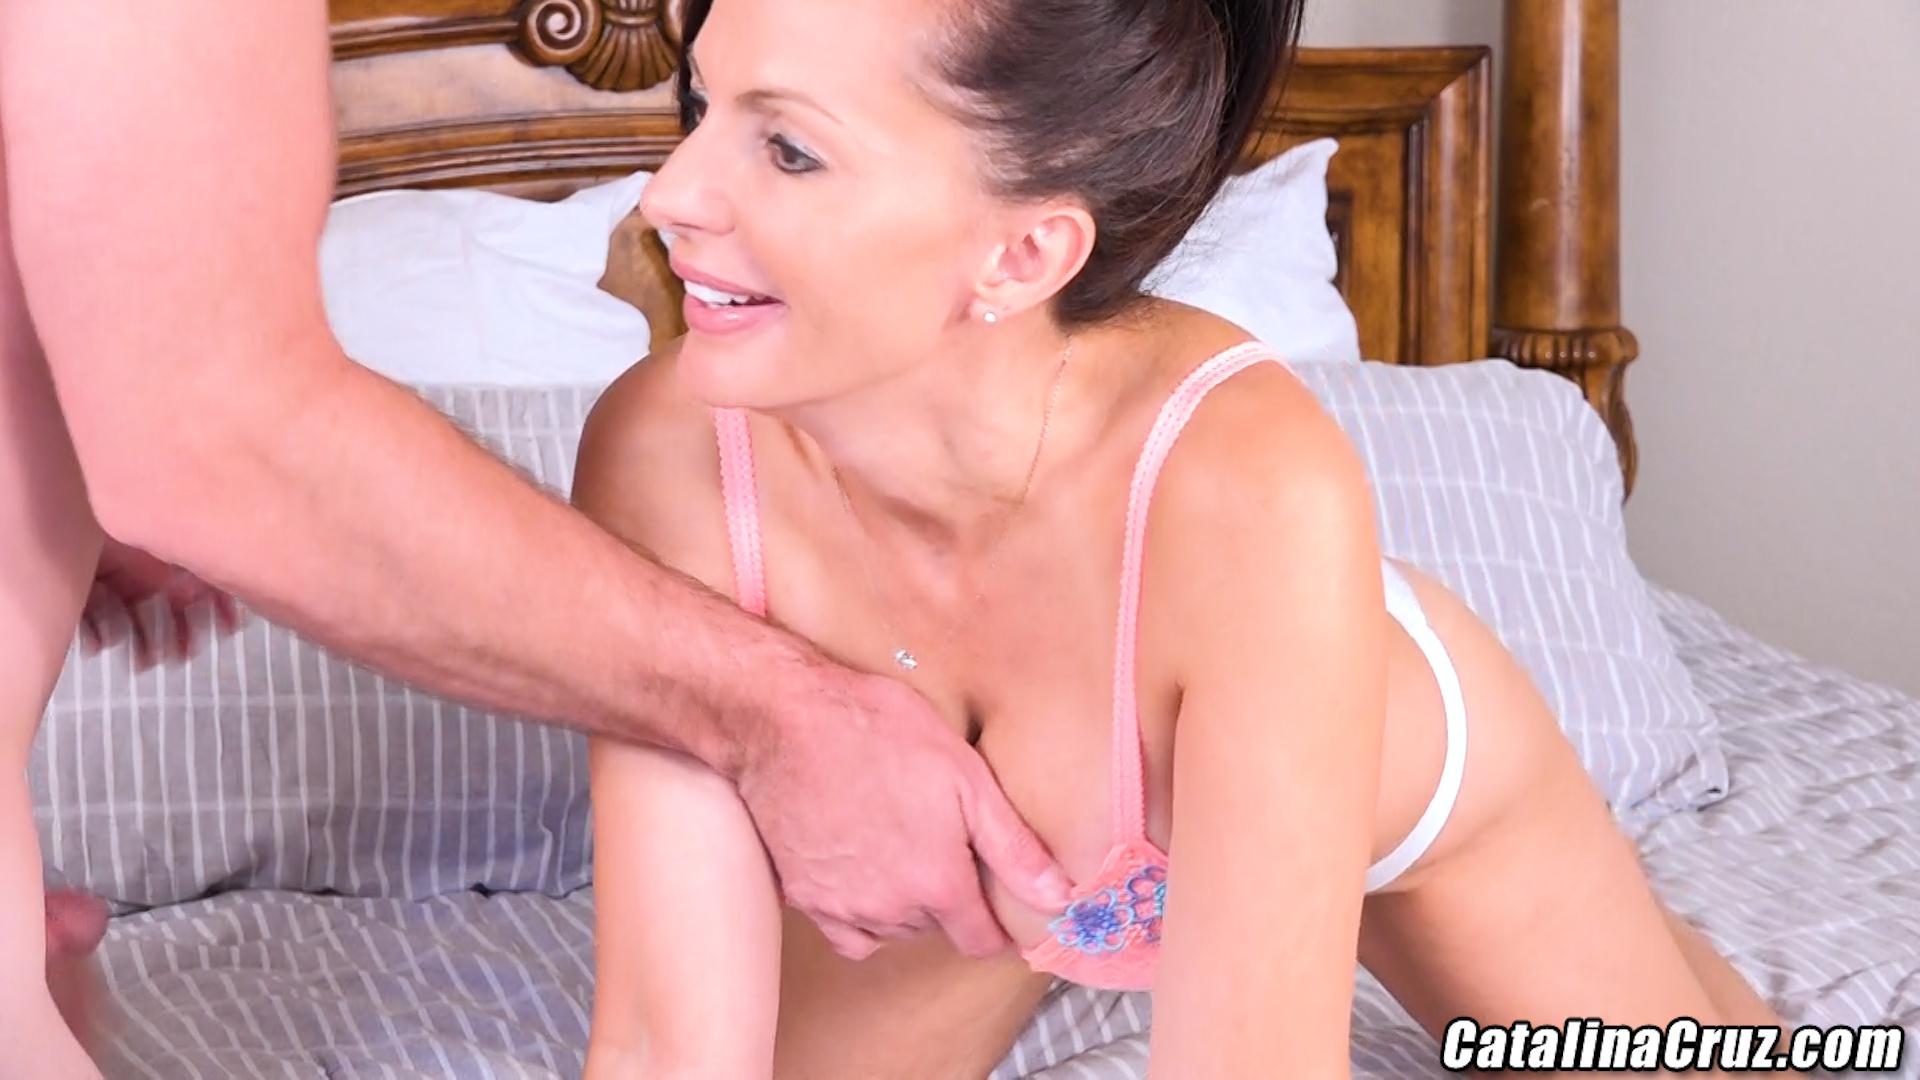 Catalina Cruz beautiful fat ass is built for anal sex ...